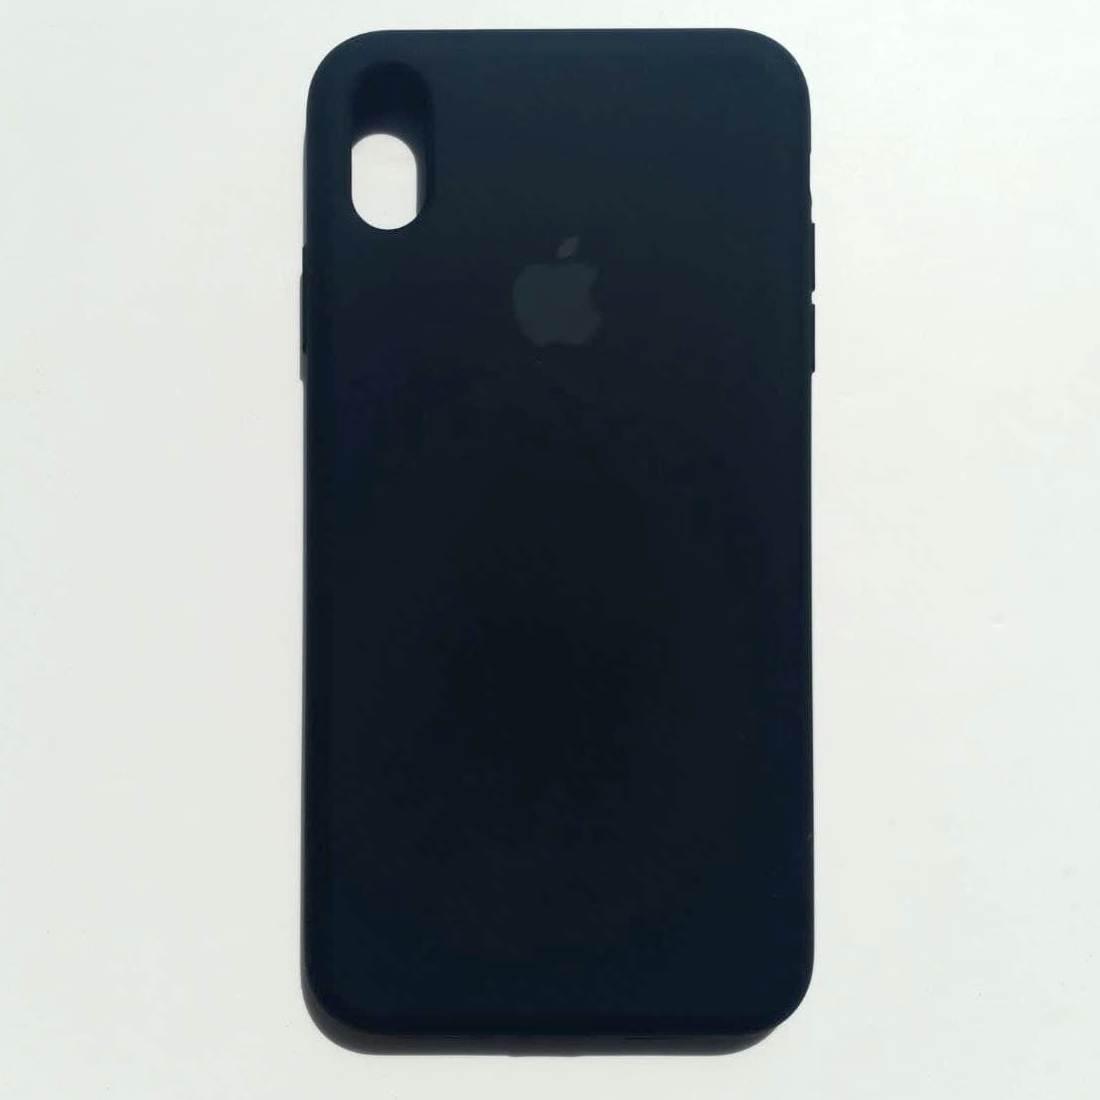 Чехол-накладка Silicone Case для Apple iPhone XS Max Black